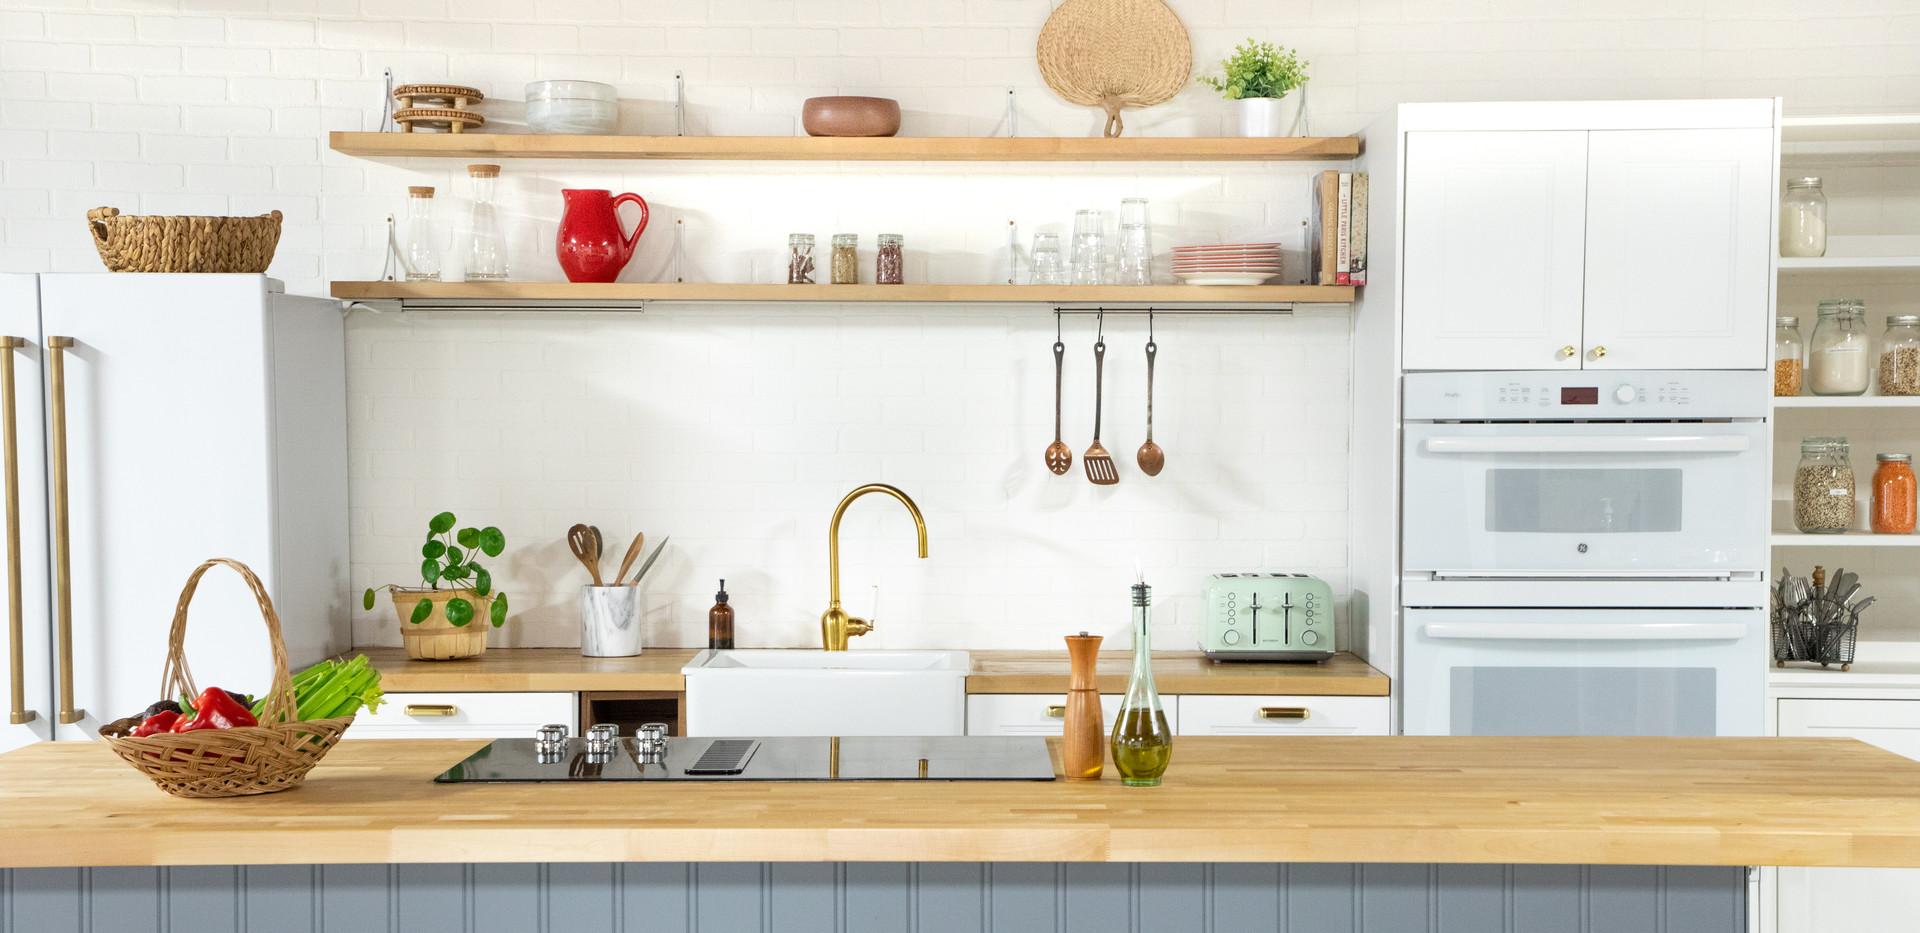 Jikoni Studios Kitchen Studio Rental_Whi